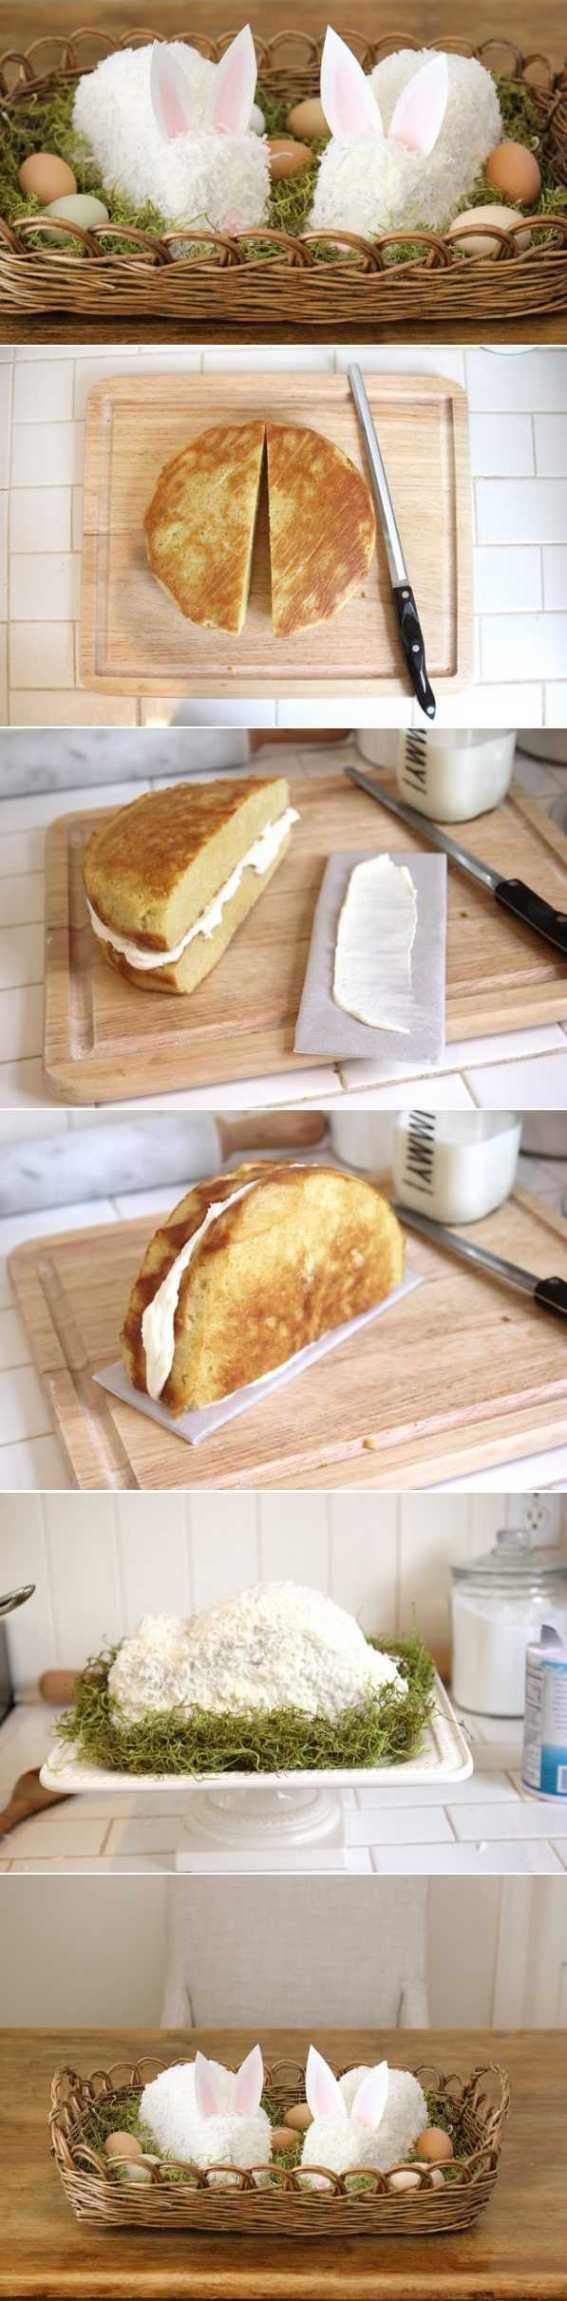 DIY Easter Bunny Cake